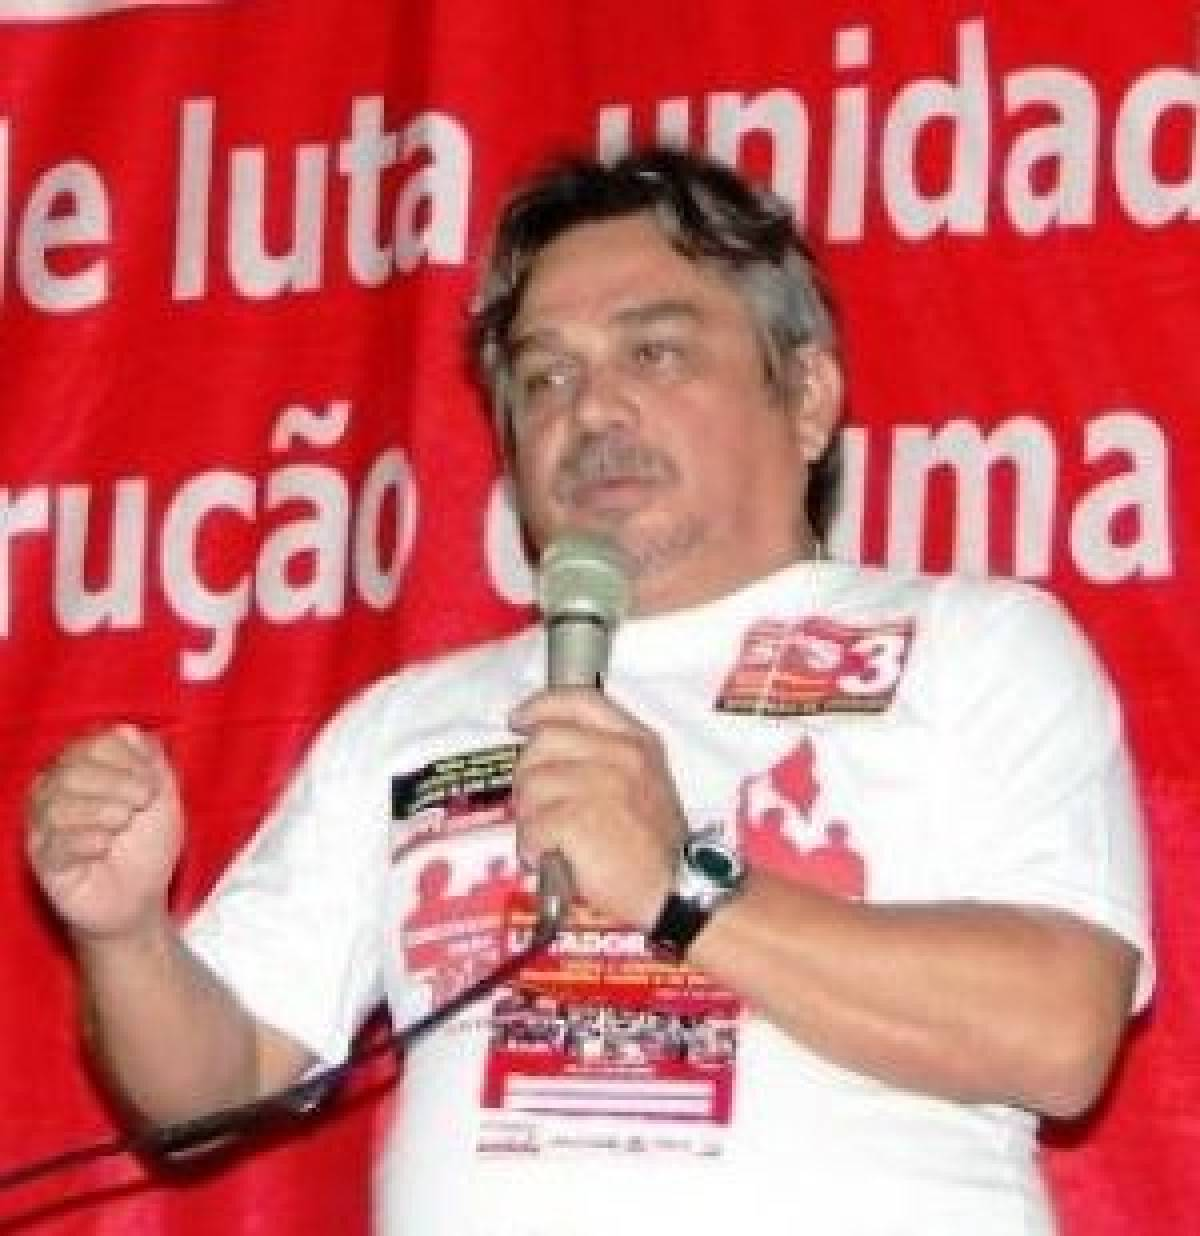 Governo Dilma ataca de banqueiro para explorar trabalhadores